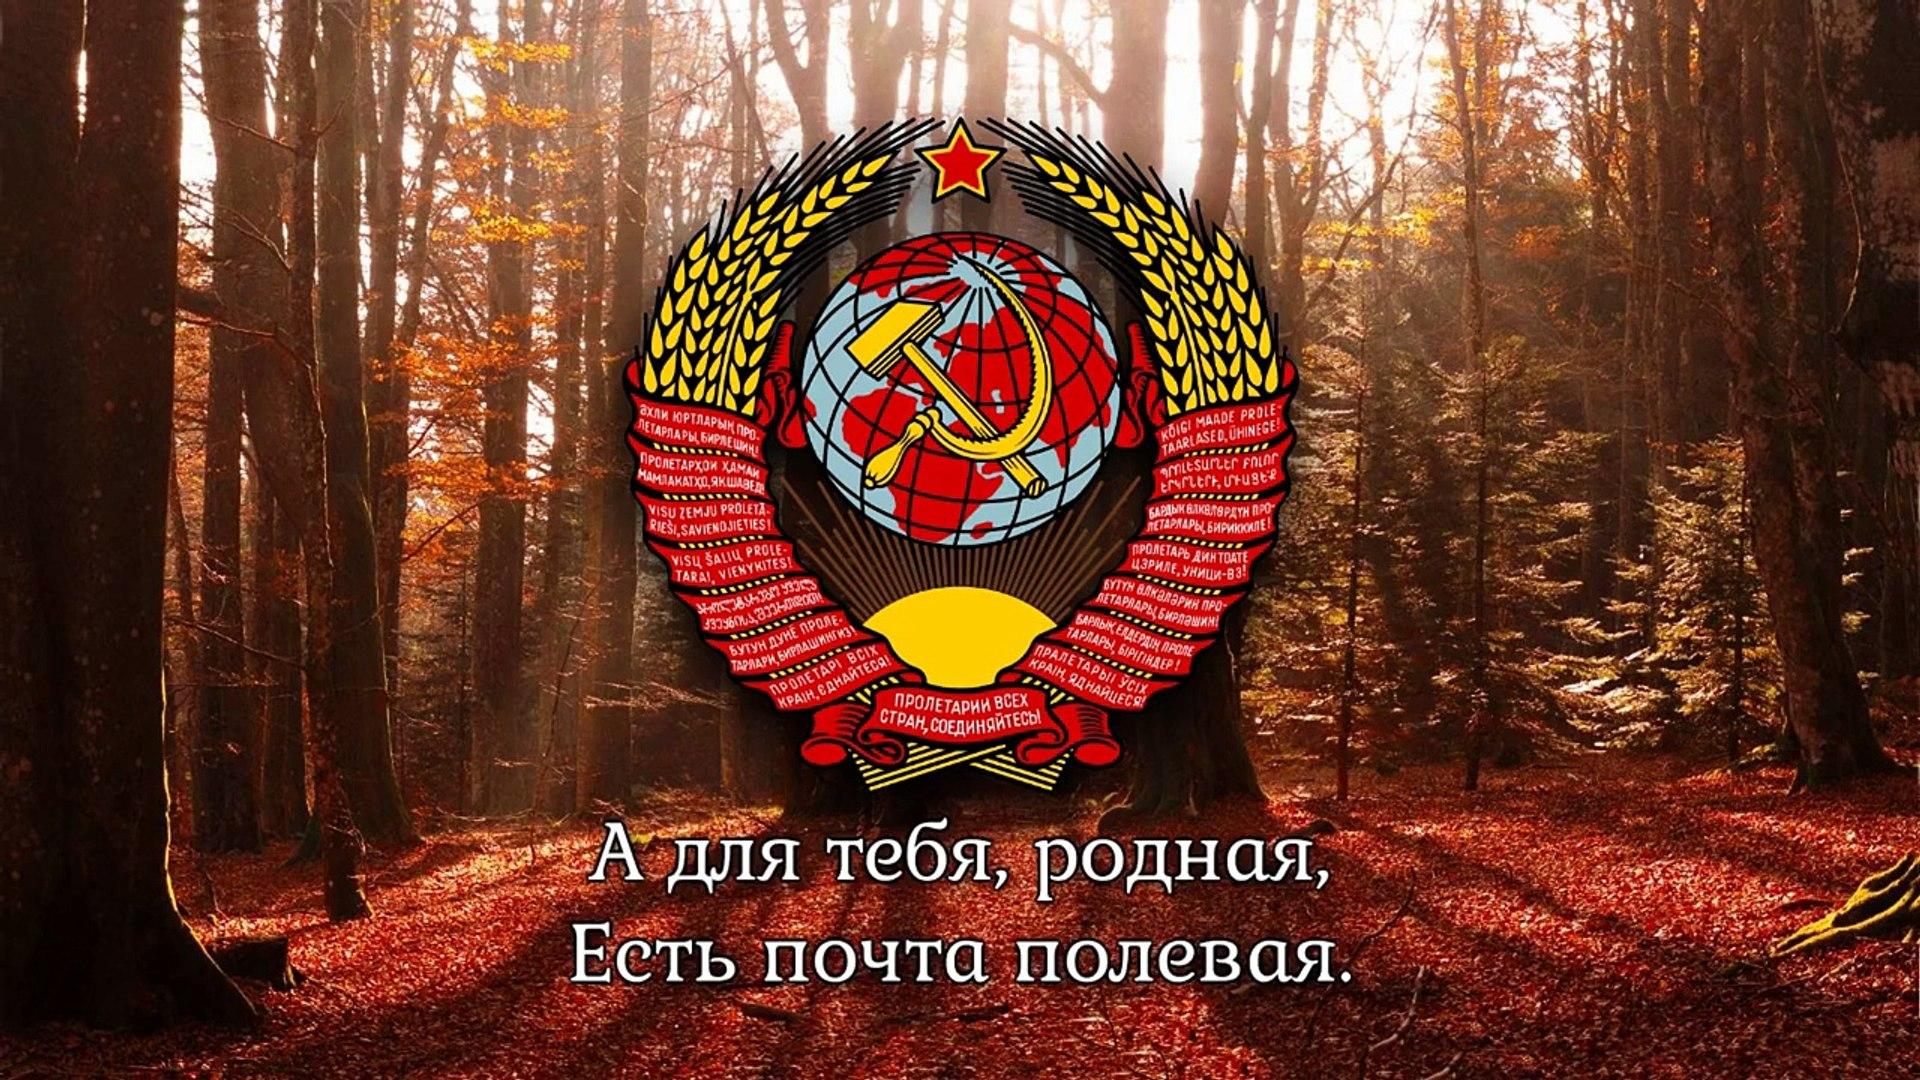 Soviet Patriotic Song - Let's go! (В путь!)